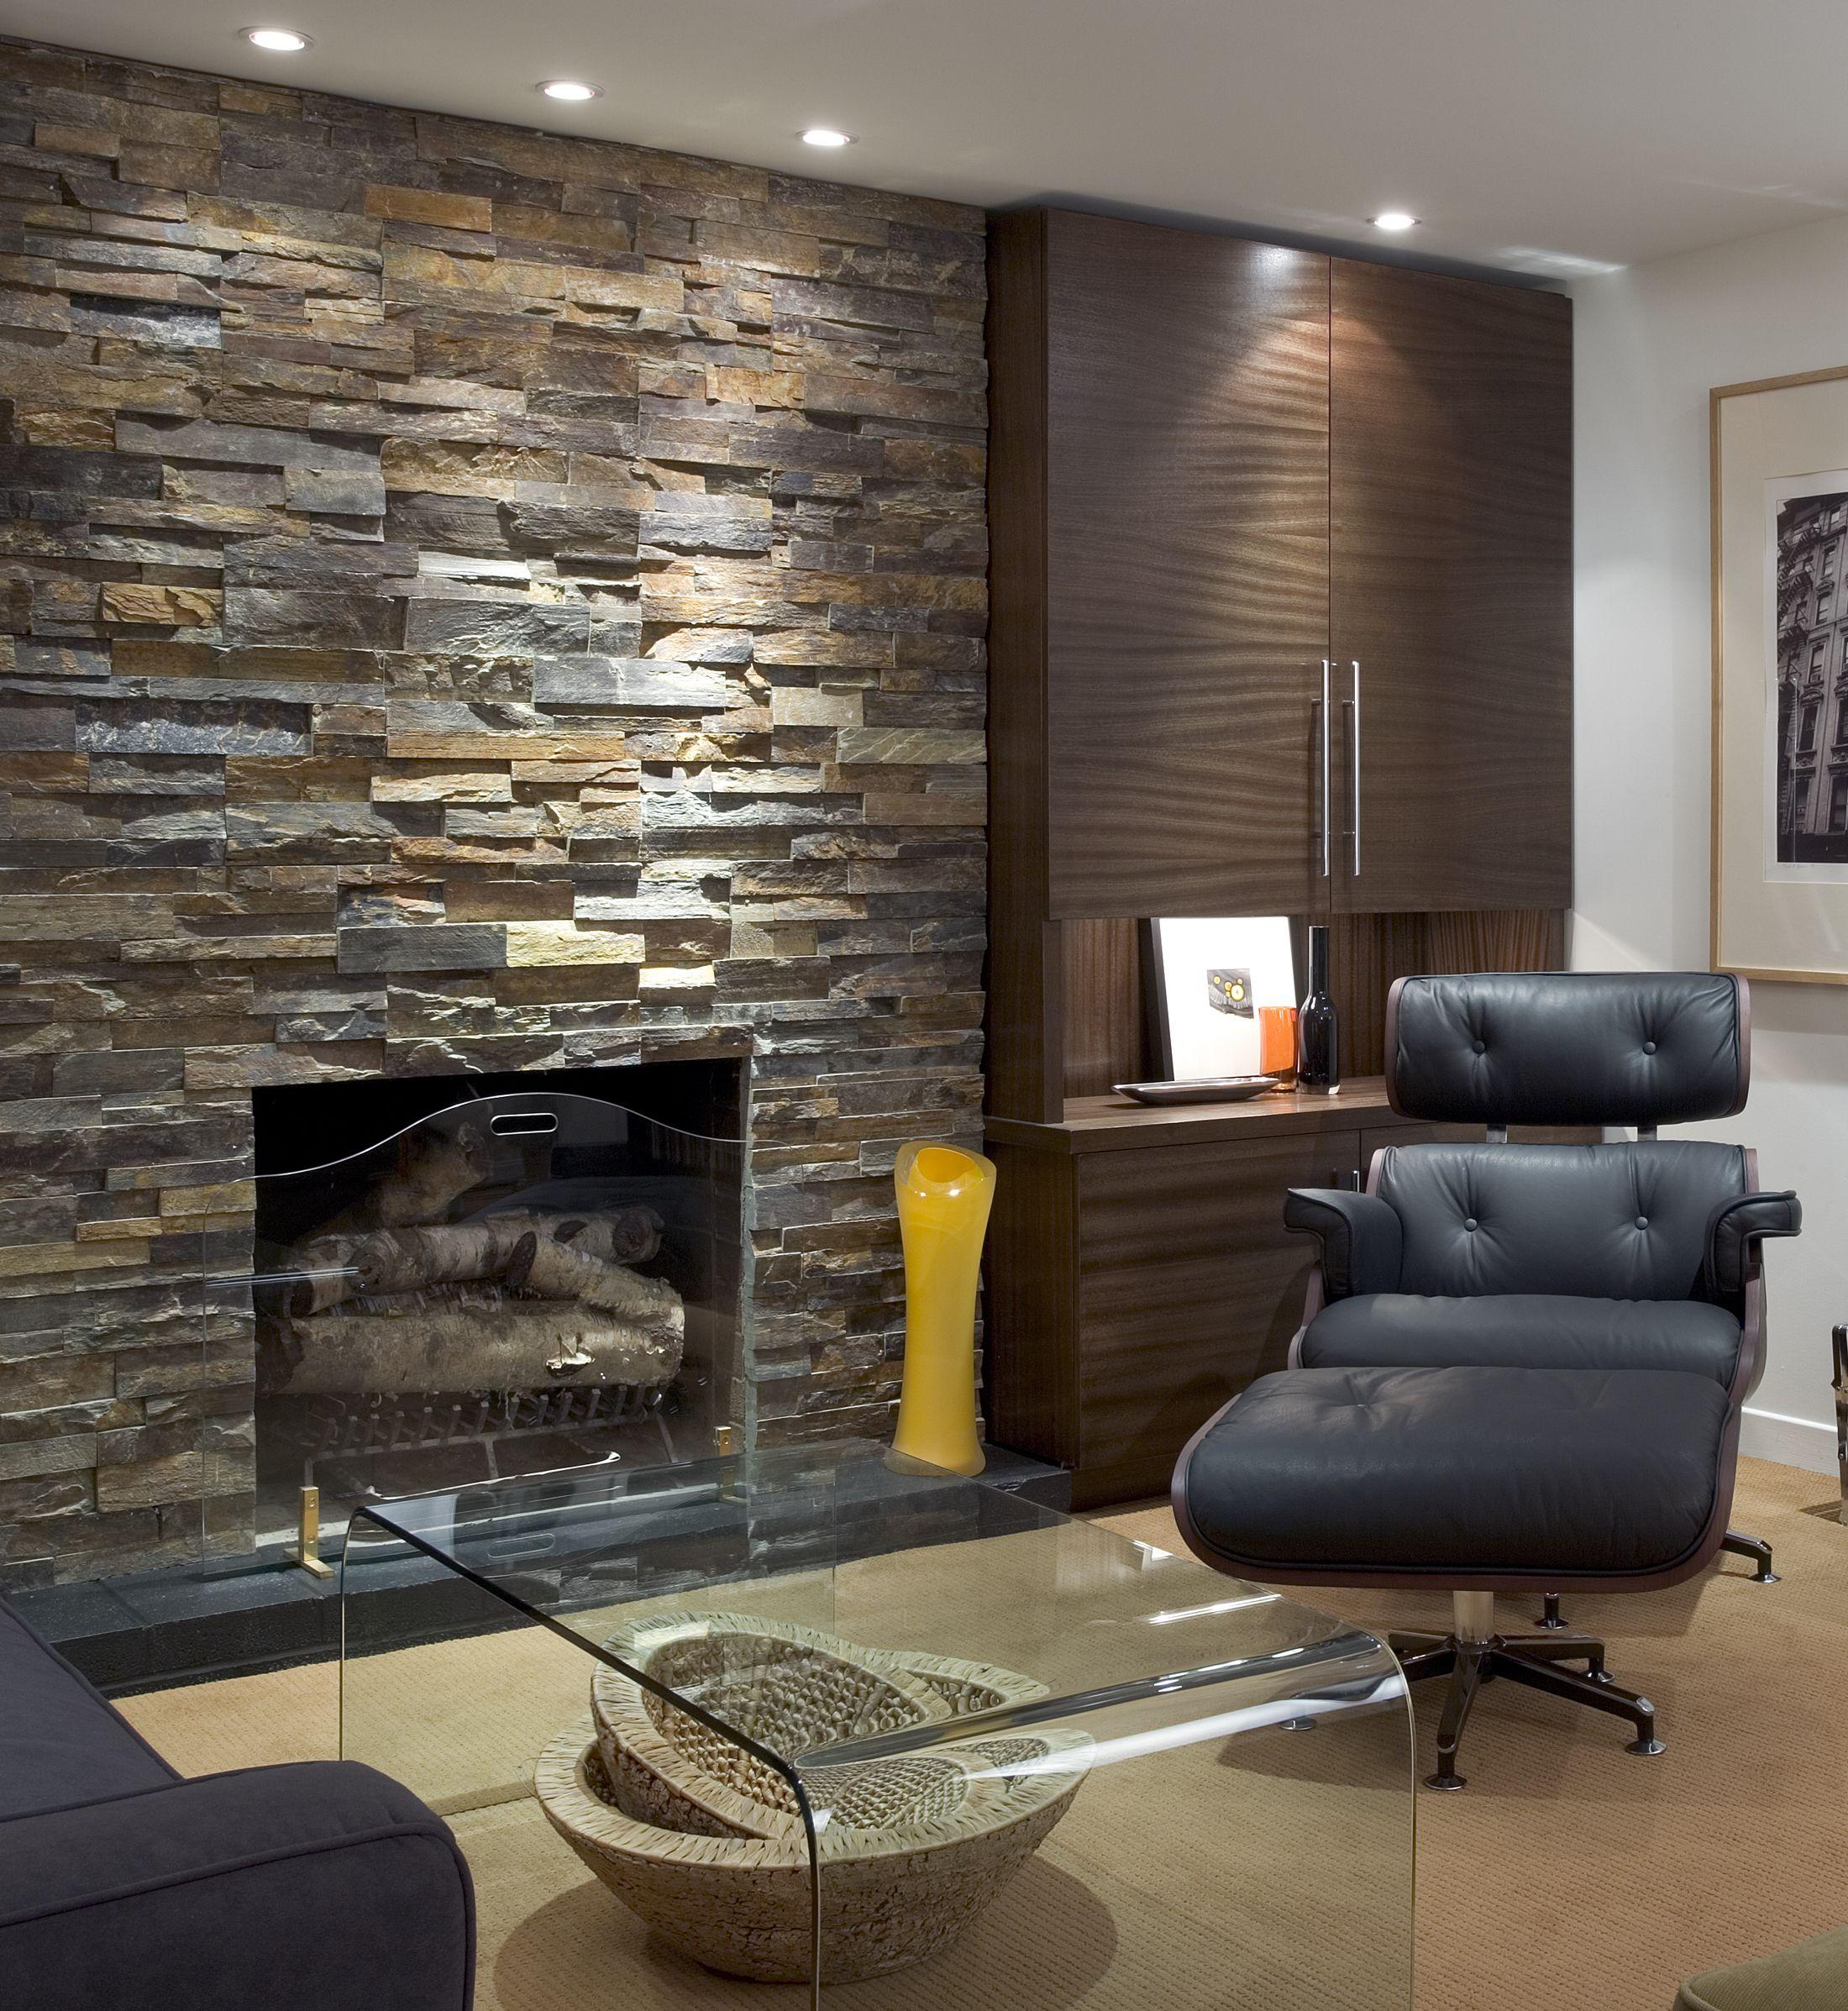 Candice Olson Basement Design: Fireplace Design By Candice Olson Design Inc #candiceolson